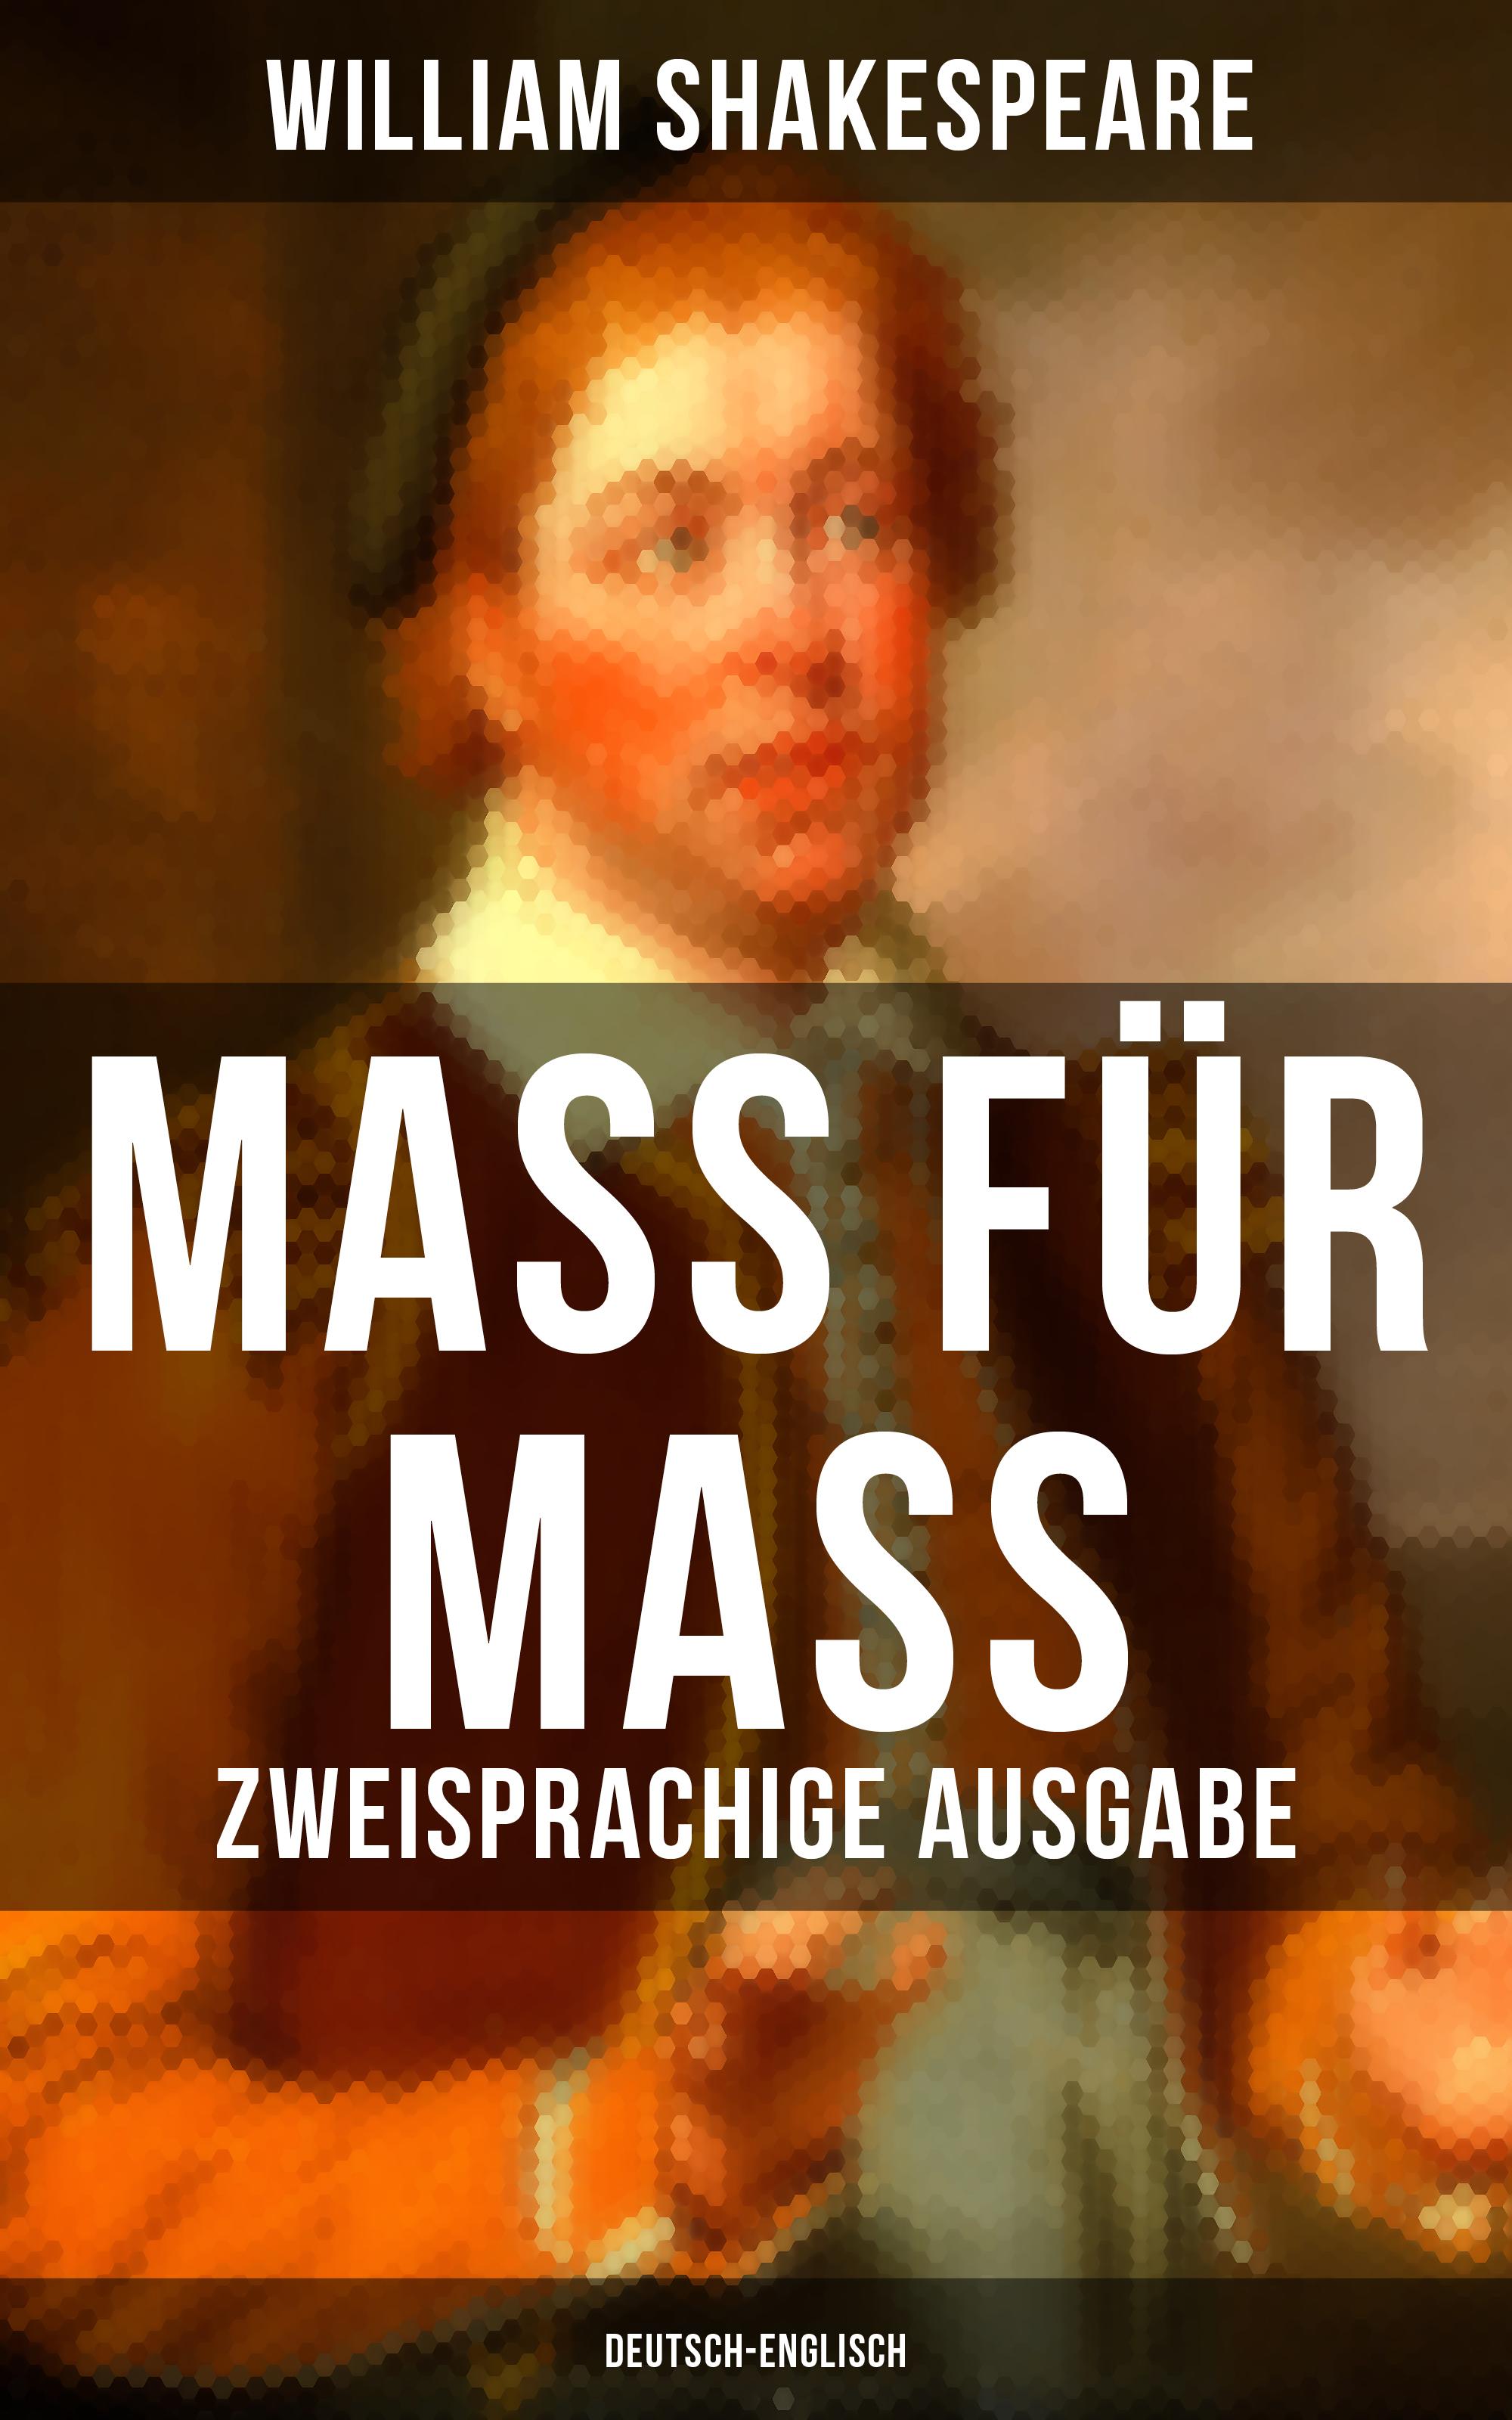 mass fur mass zweisprachige ausgabe deutsch englisch